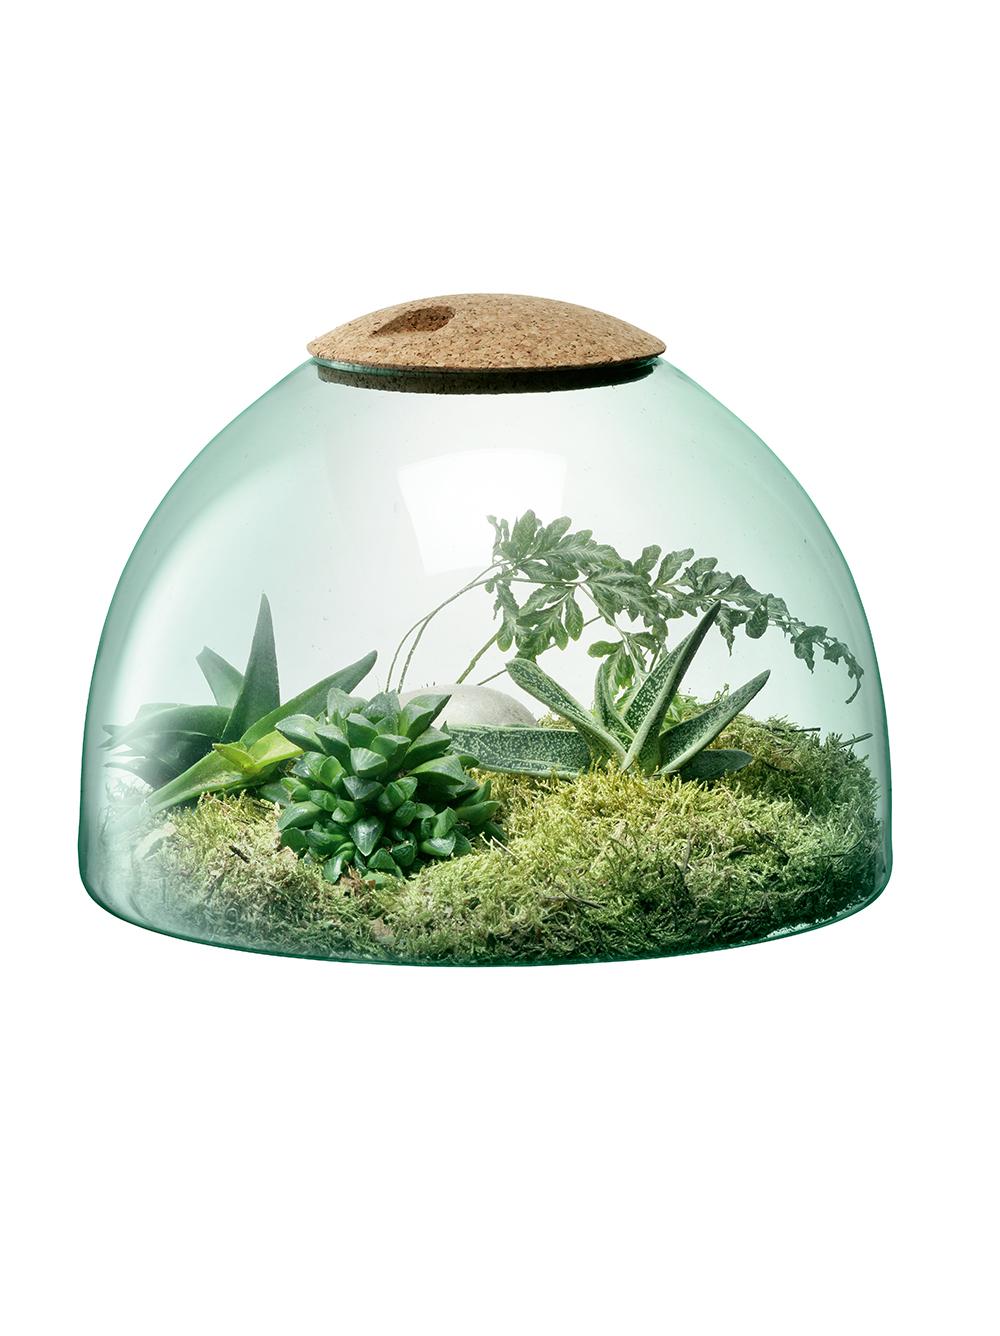 LSA canopy closed garden terrarium